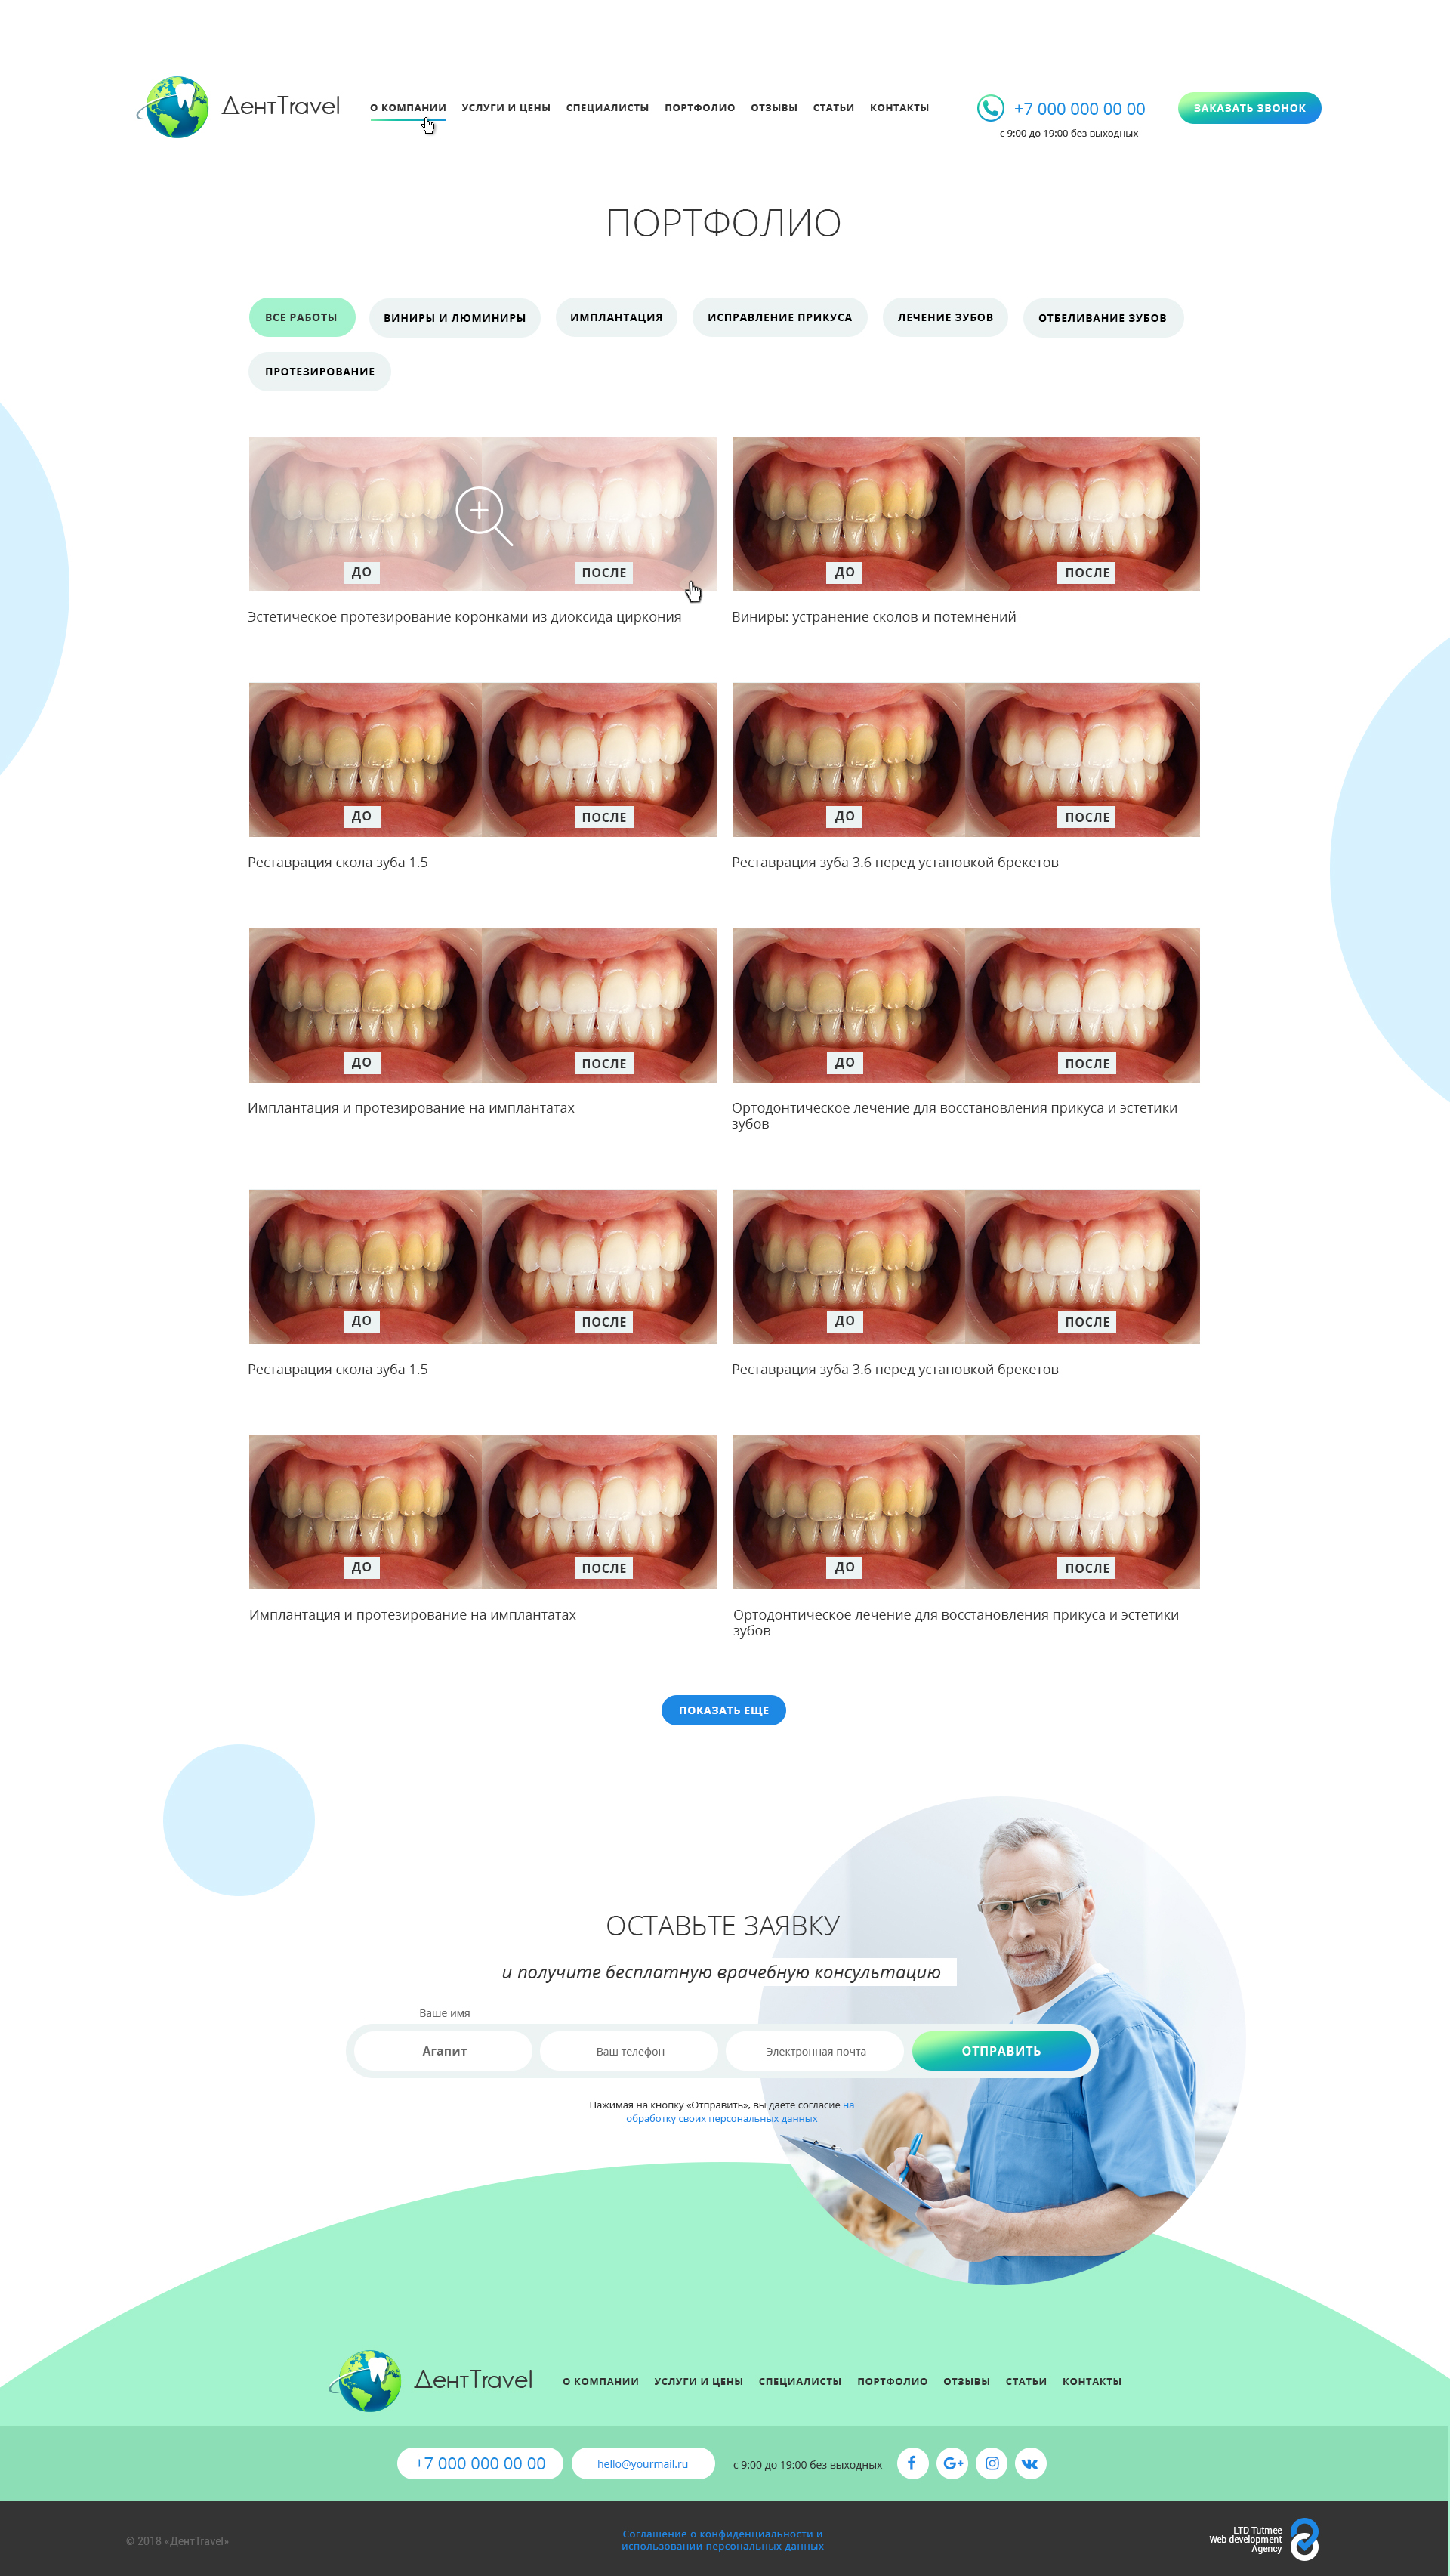 Адаптивный сайт ДентТравел - Стоматологический туризм